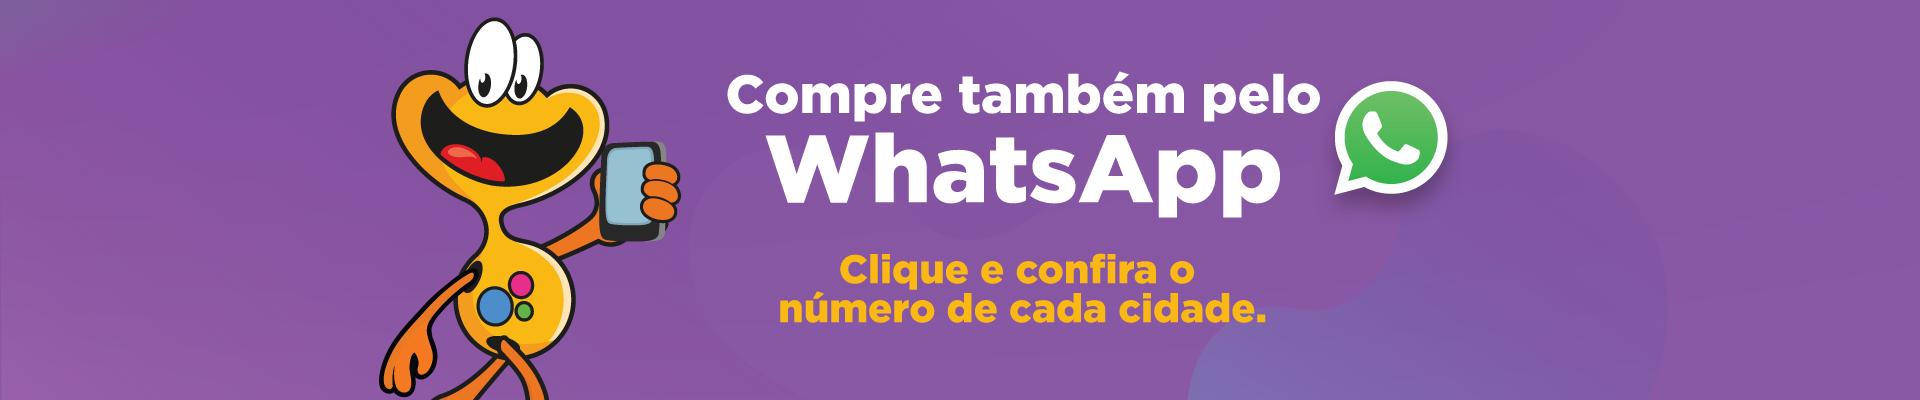 Inform. Whats